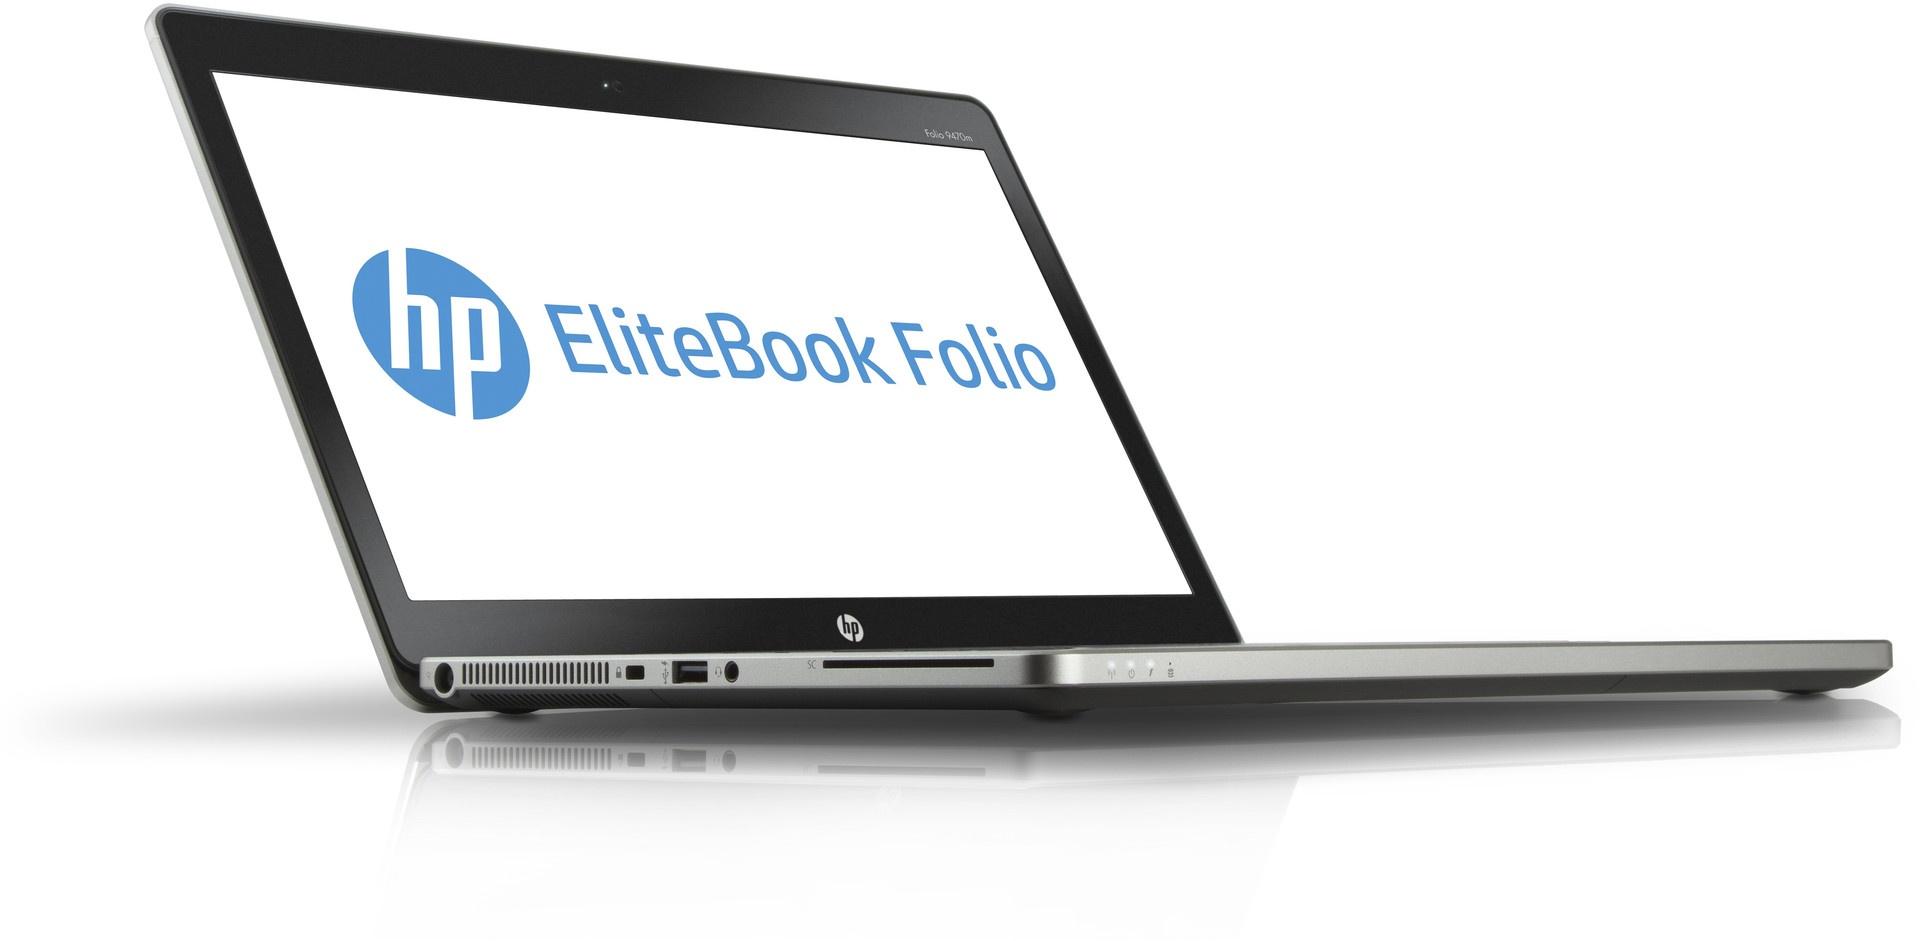 HP Elitebook Folio 9470m  i7 SSD